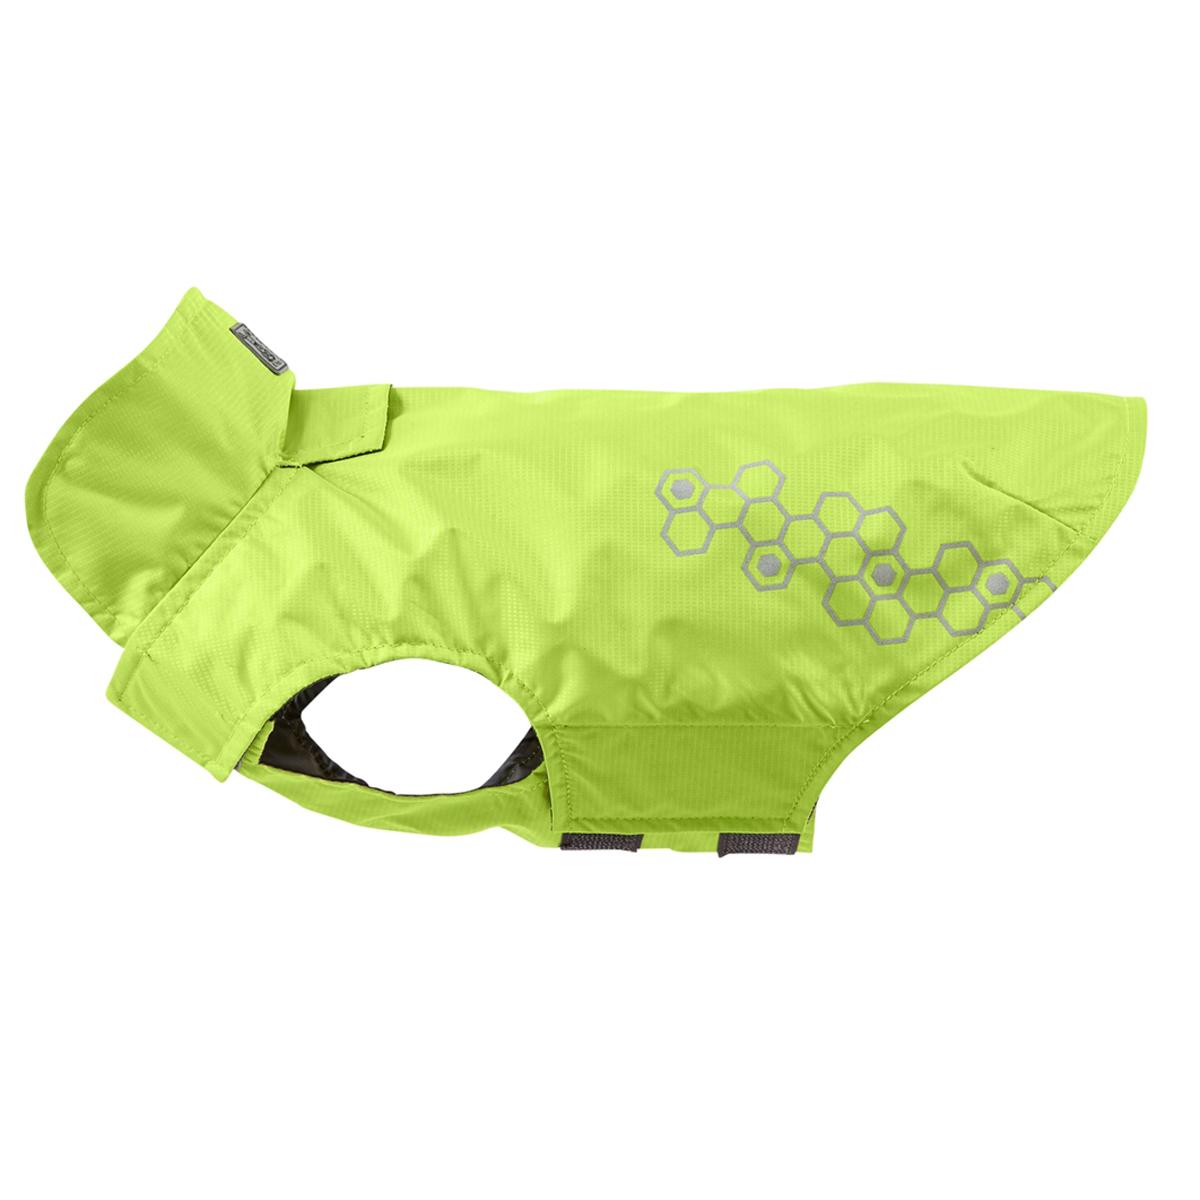 Venture Shell Slicker Dog Jacket - Lime Punch